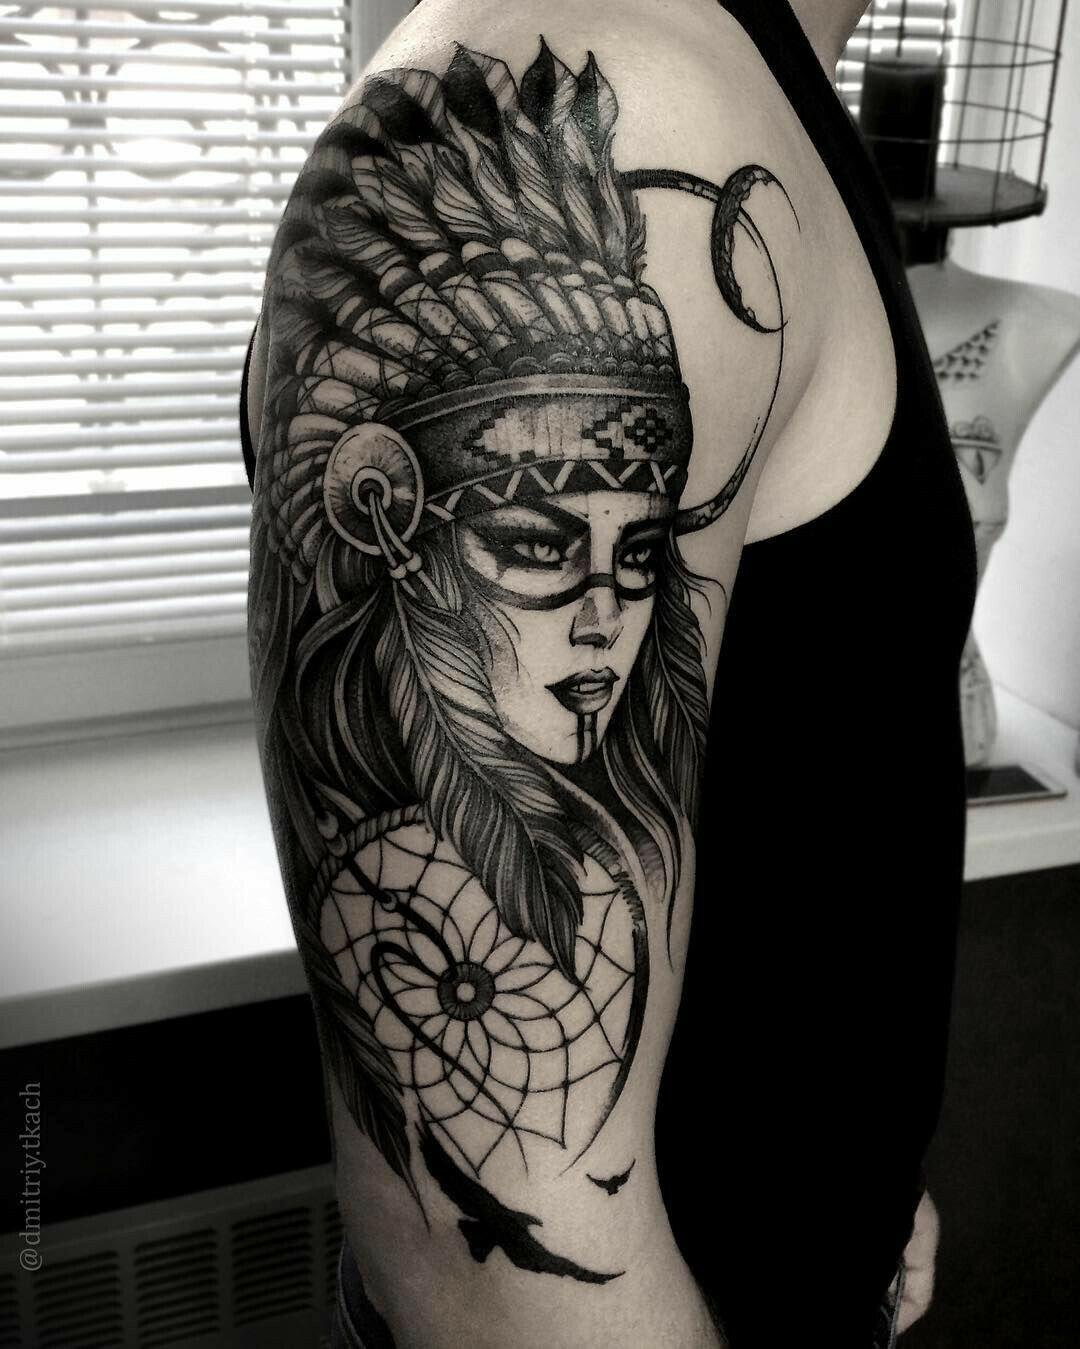 Pin by Luciano Troiani on tatoo  Pinterest  Tattoo Tatoo and Tattos